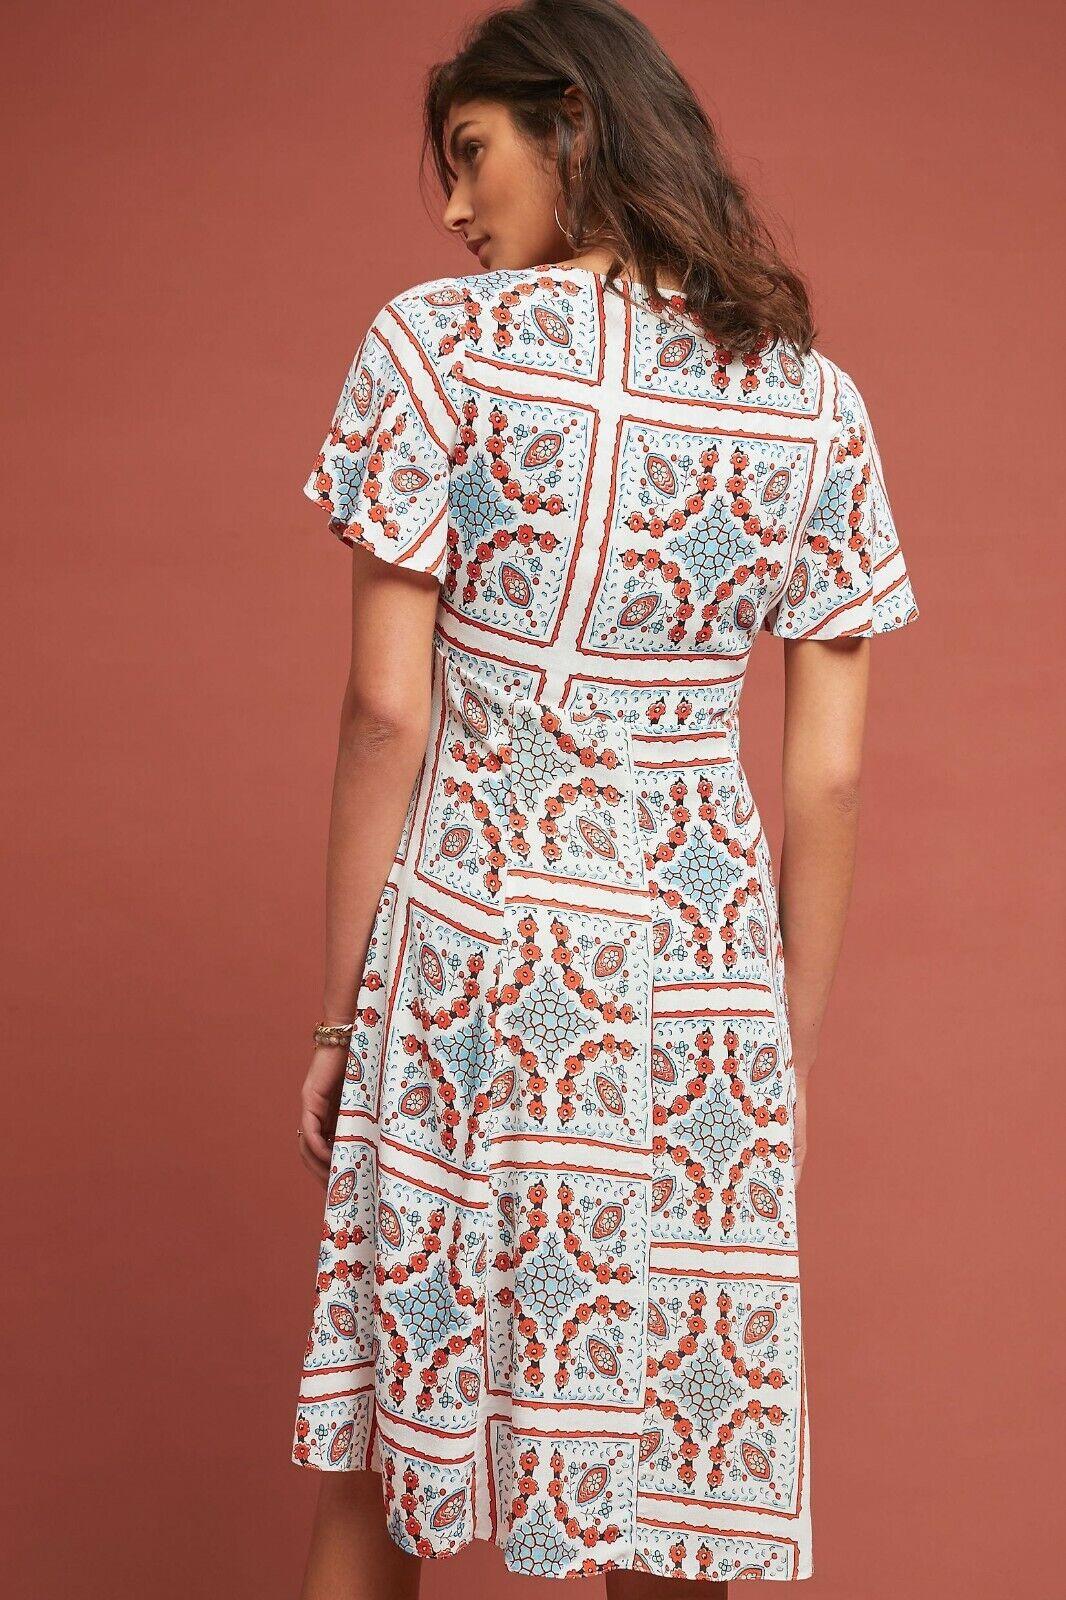 Anthropologie Maeve Praslin Floral Buttondown Dress  size 10 10 10 NEW  138 0be7c3